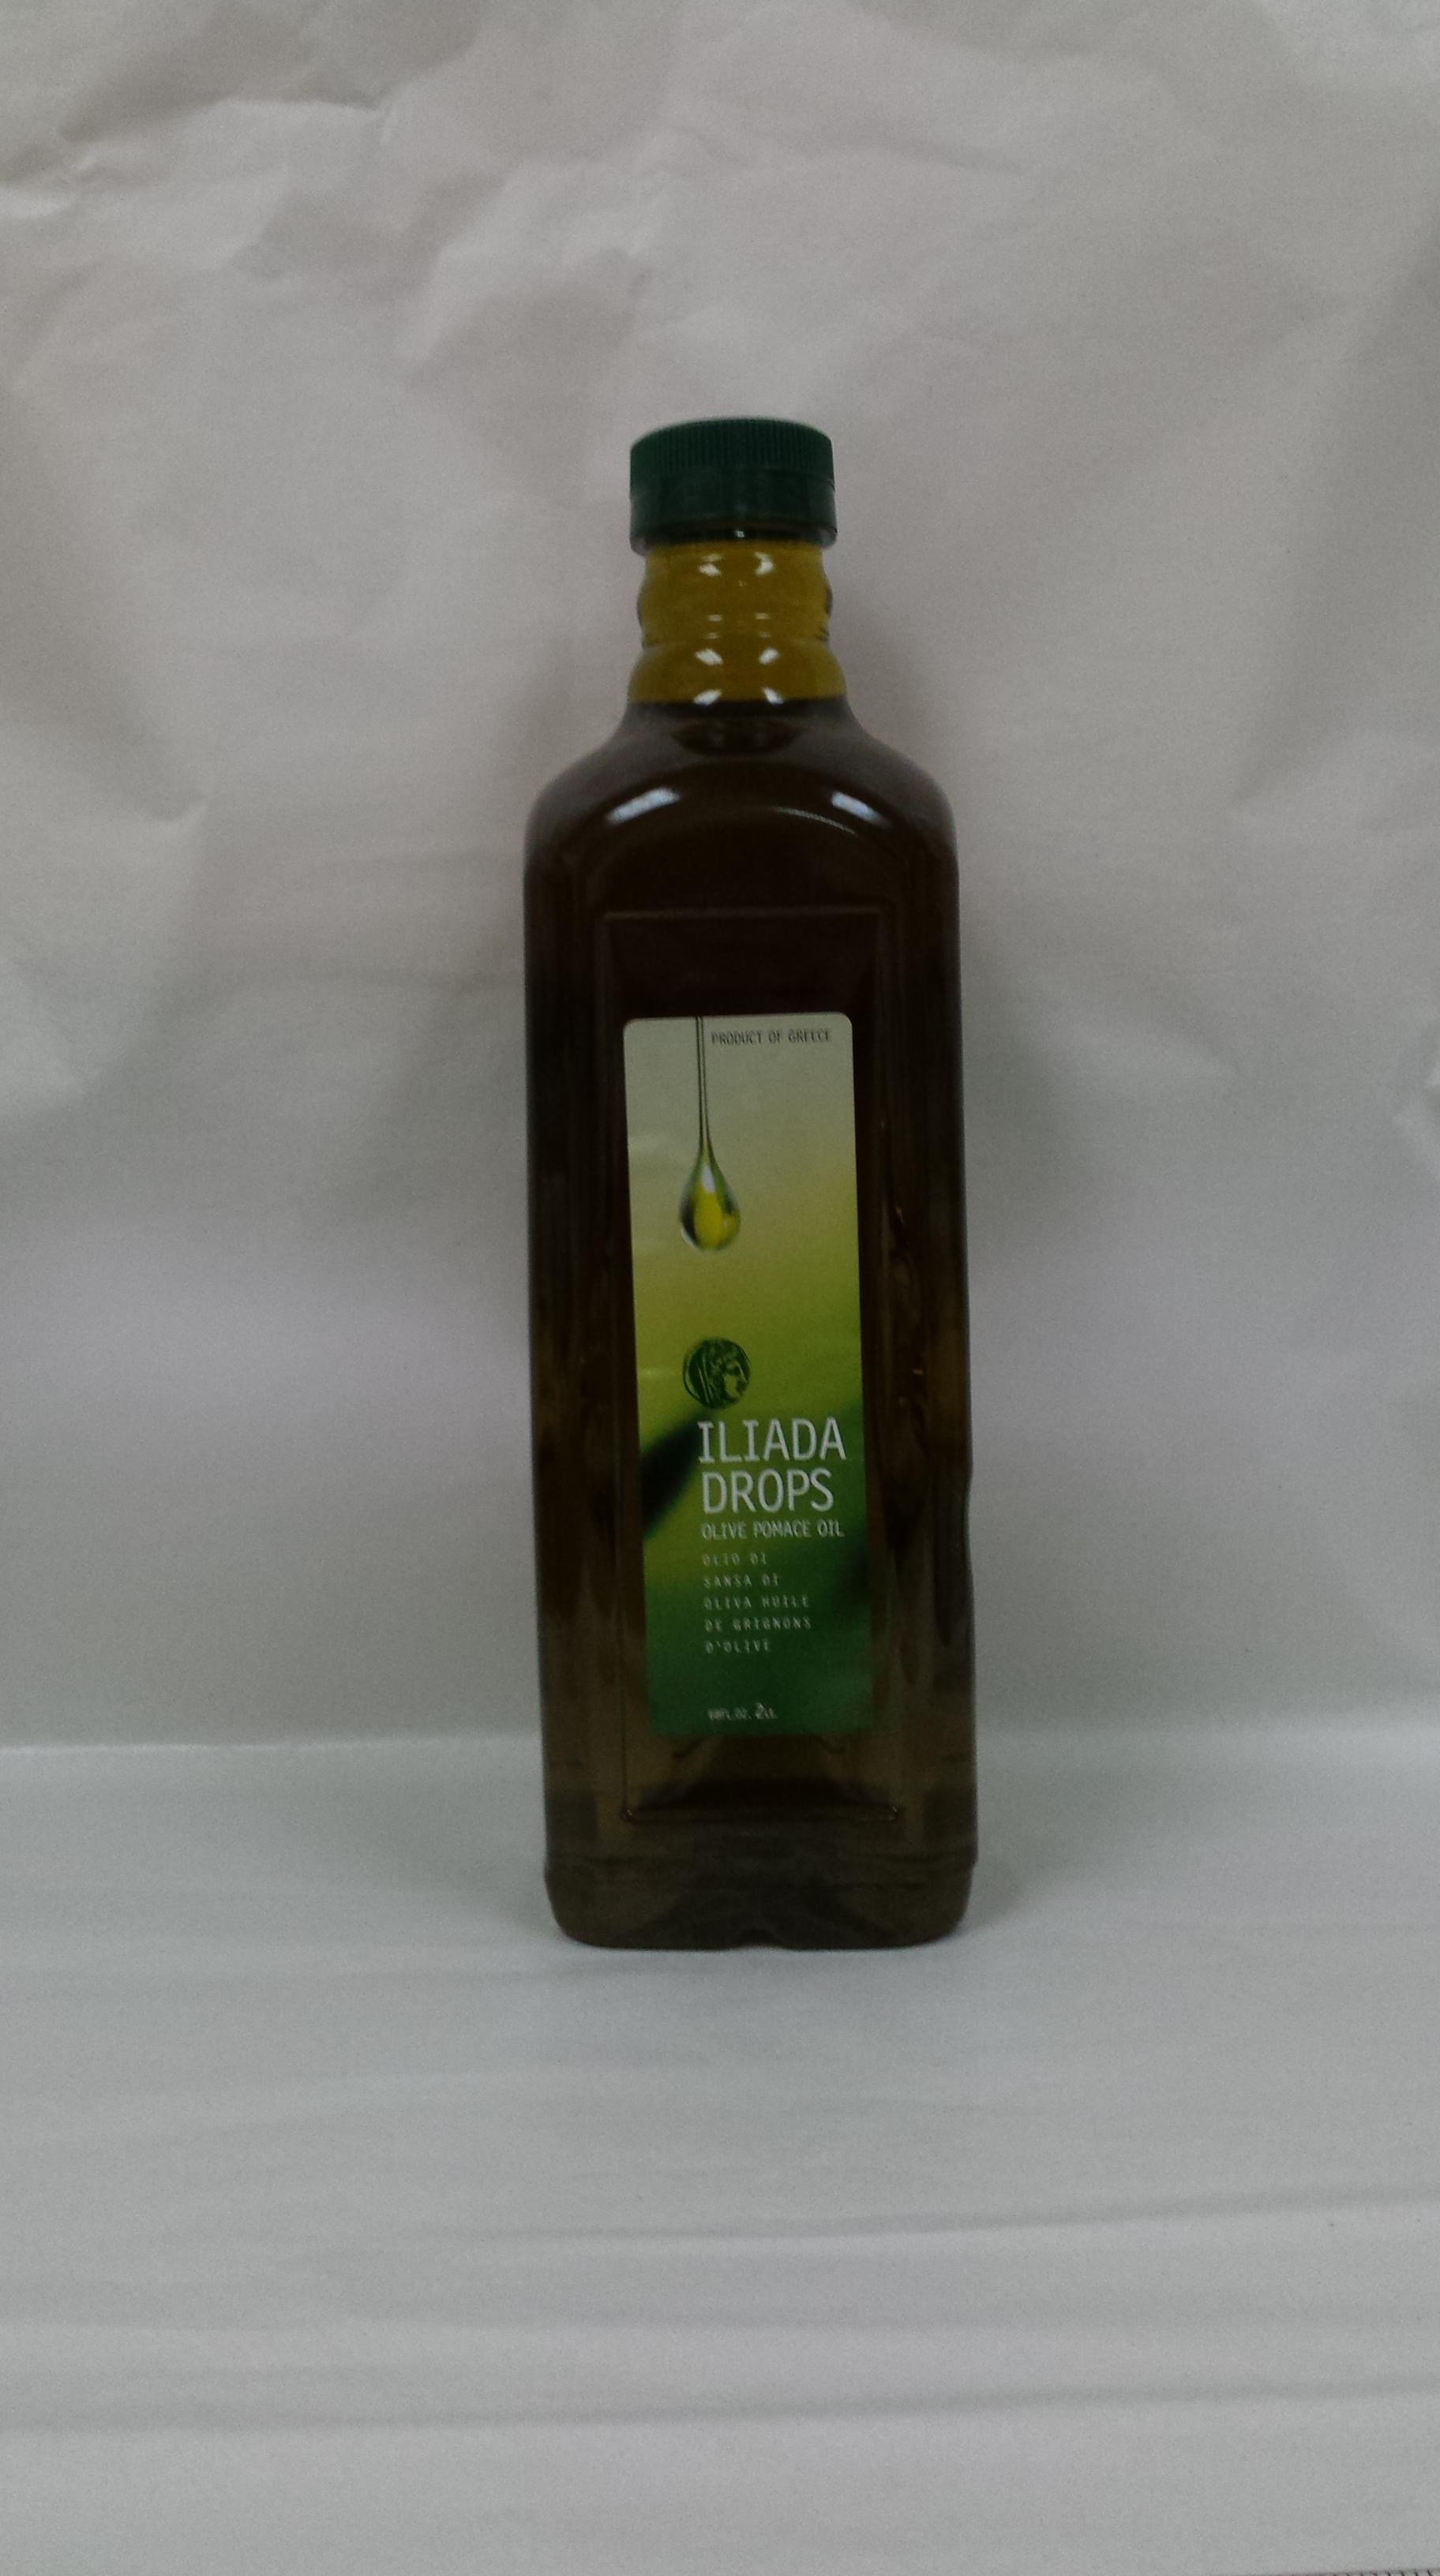 Greek Olive Pomace Cooking Oil 希臘煮食用橄欖油 2L – 文和國際(香港)有限公司 Manful International (HK) Limited